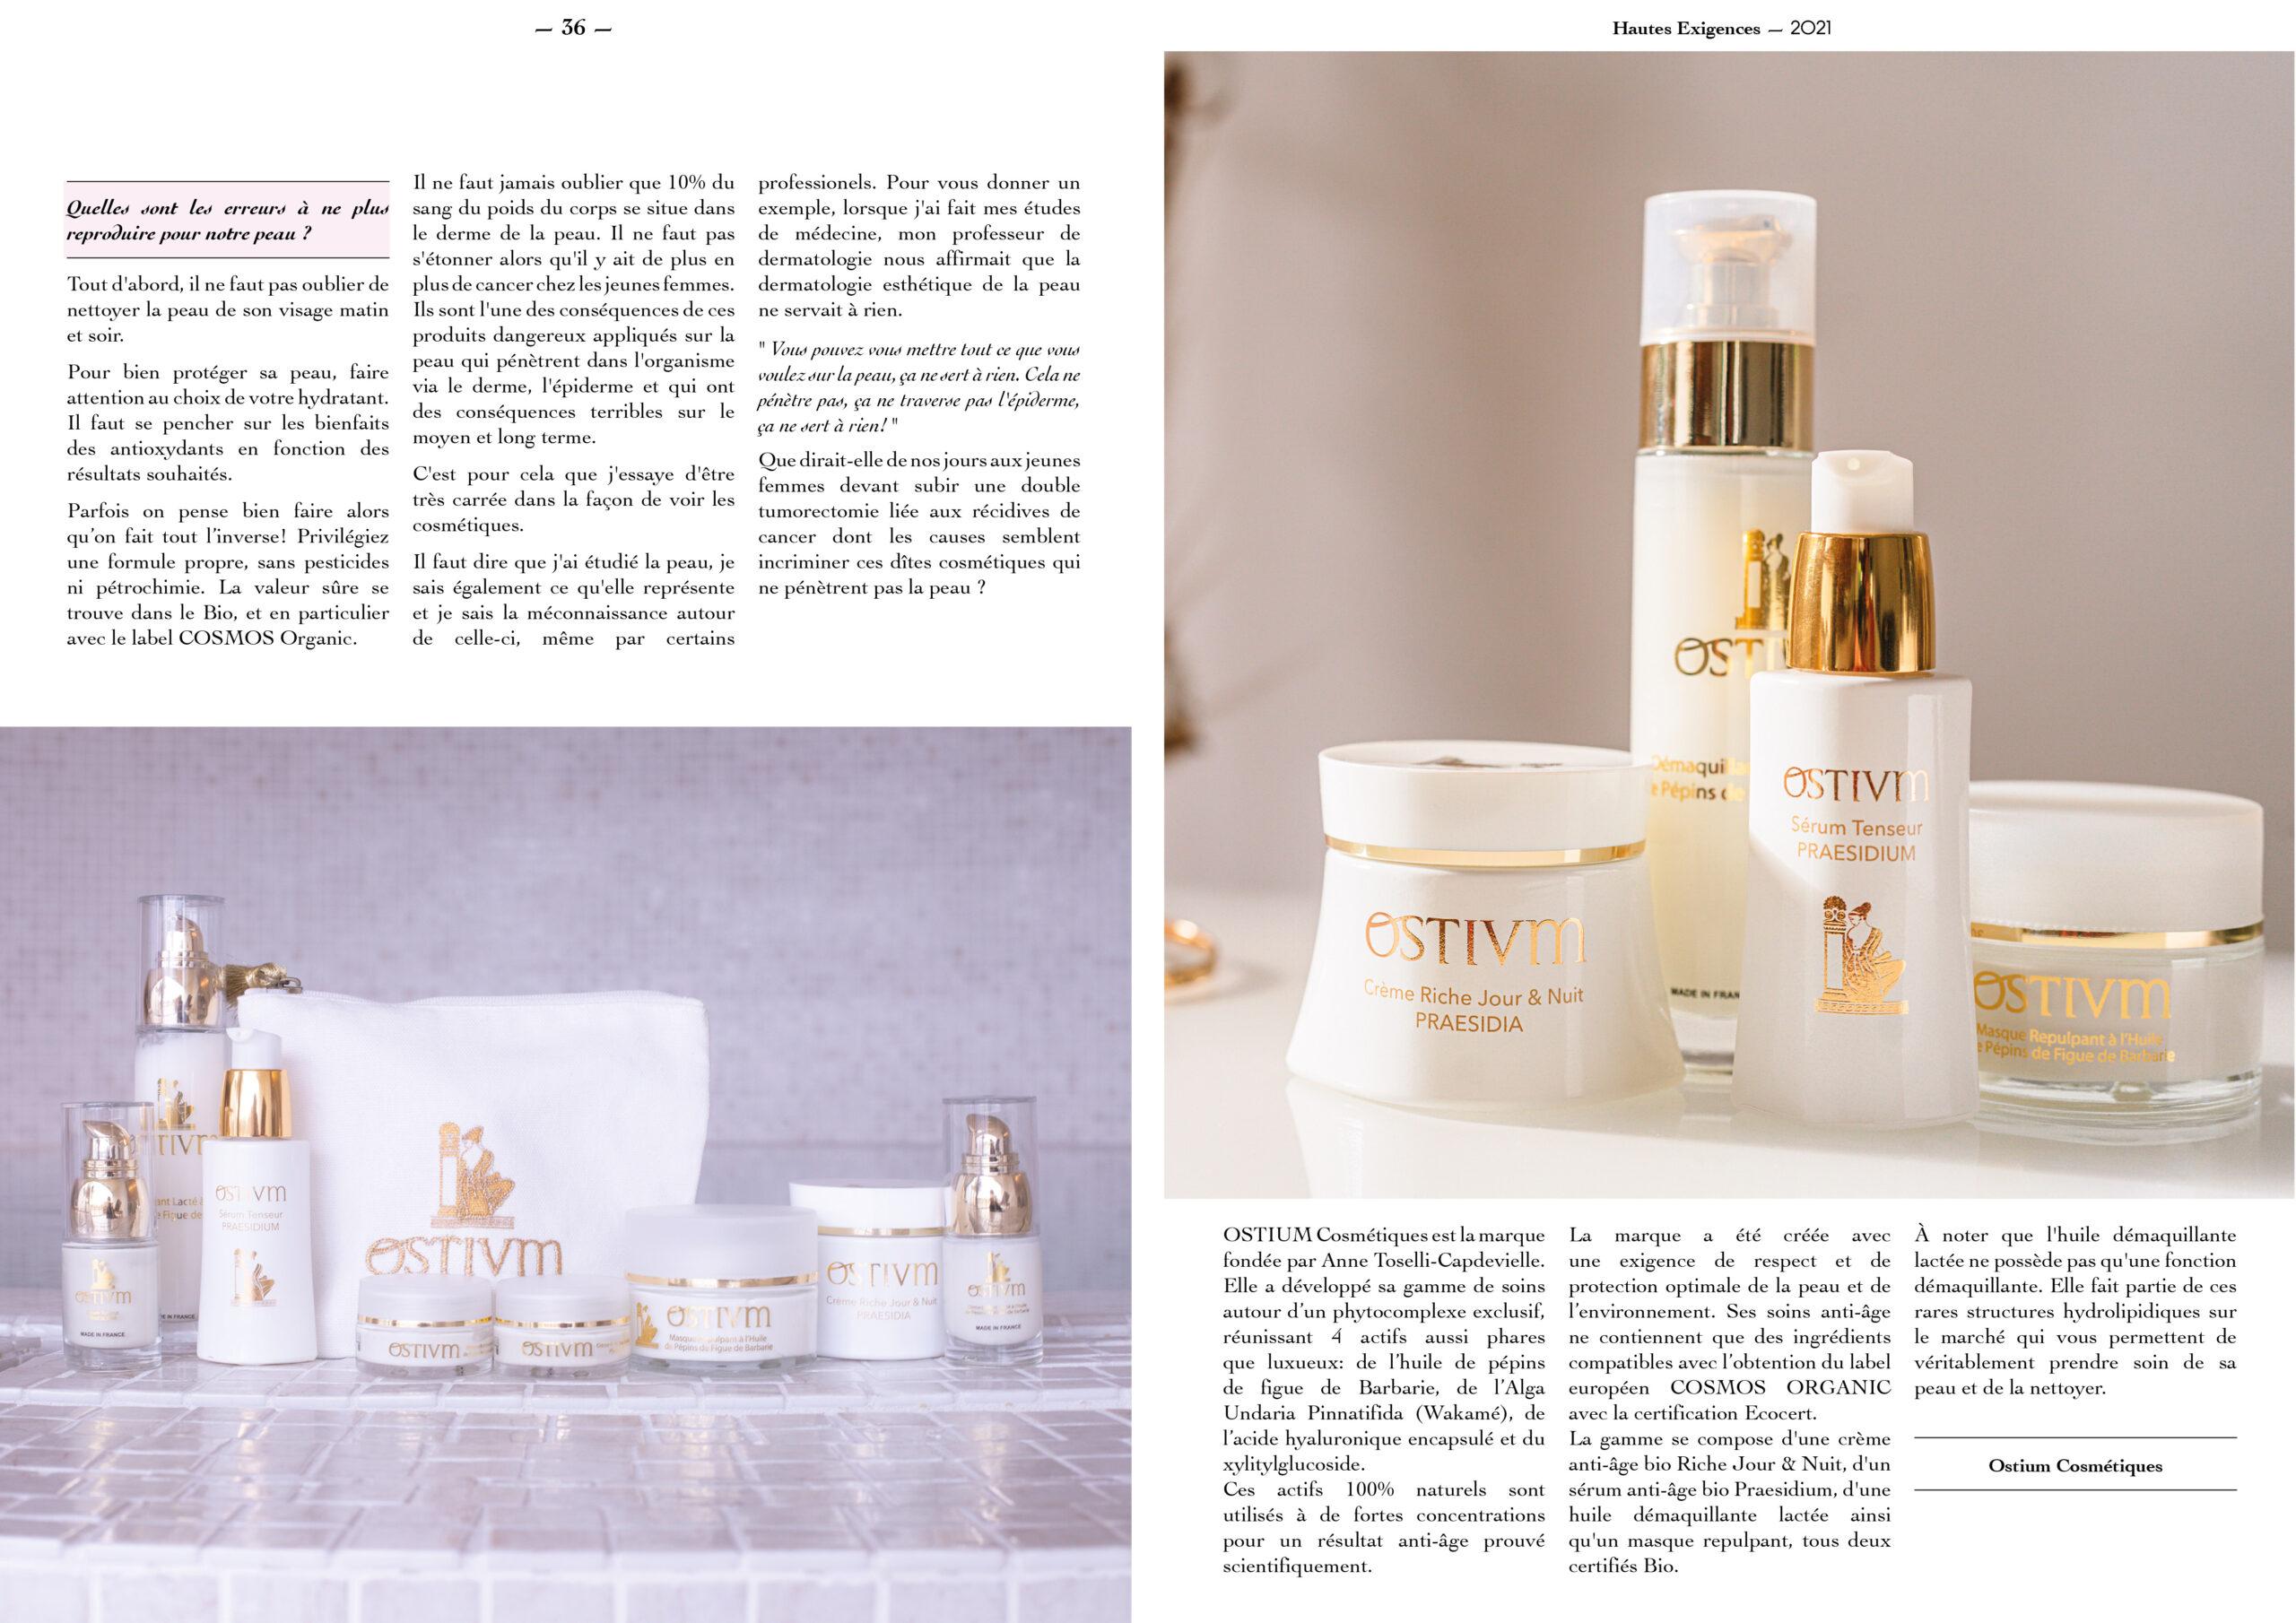 Hautes Exigences Magazine Hors Serie 2021 page 36-37